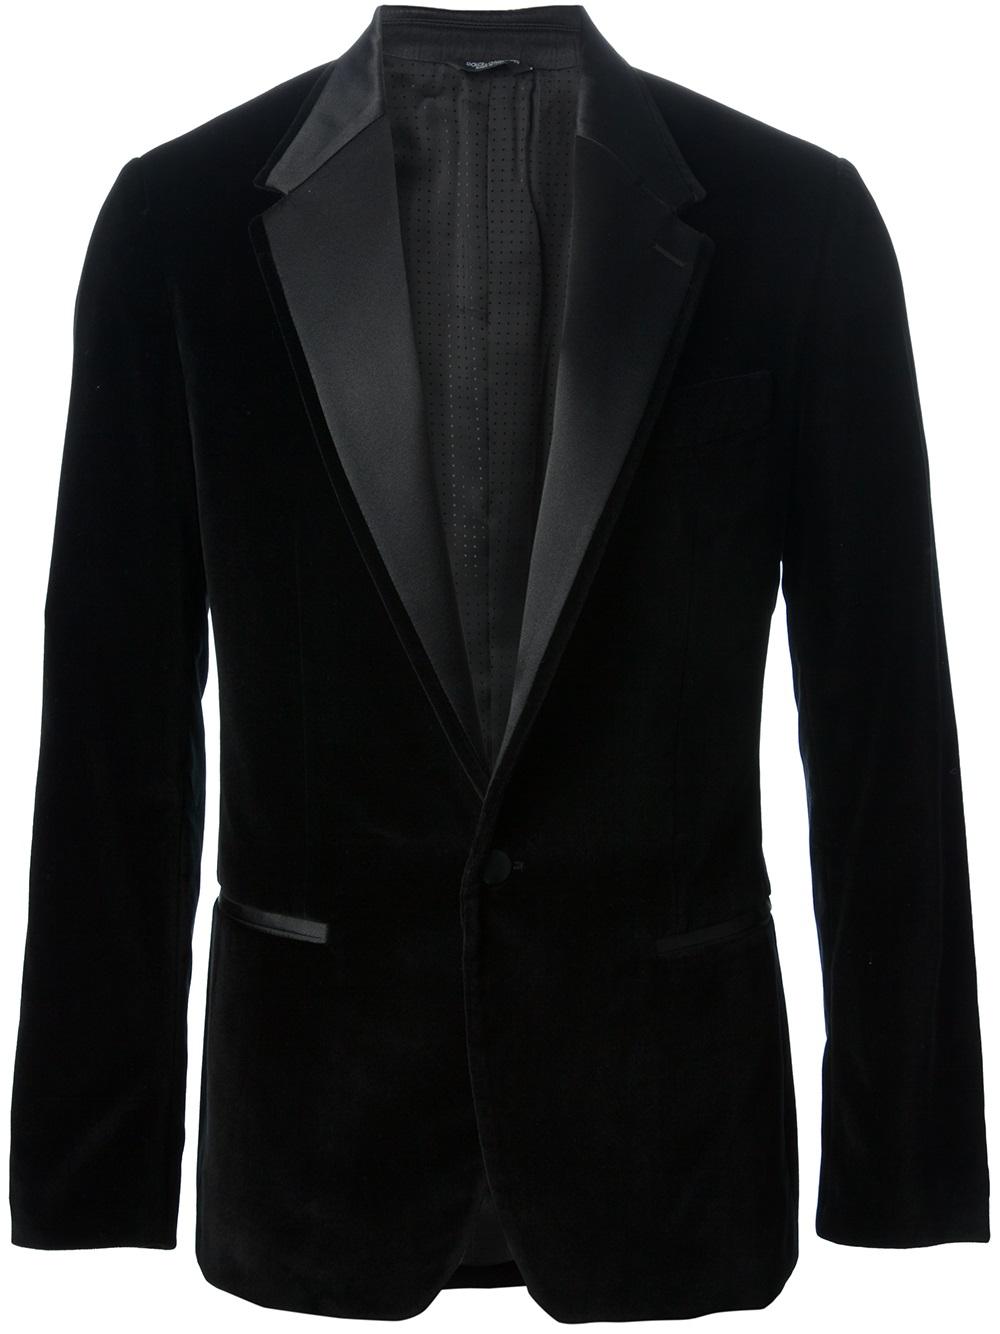 Dolce Amp Gabbana Smoking Jacket In Black For Men Lyst